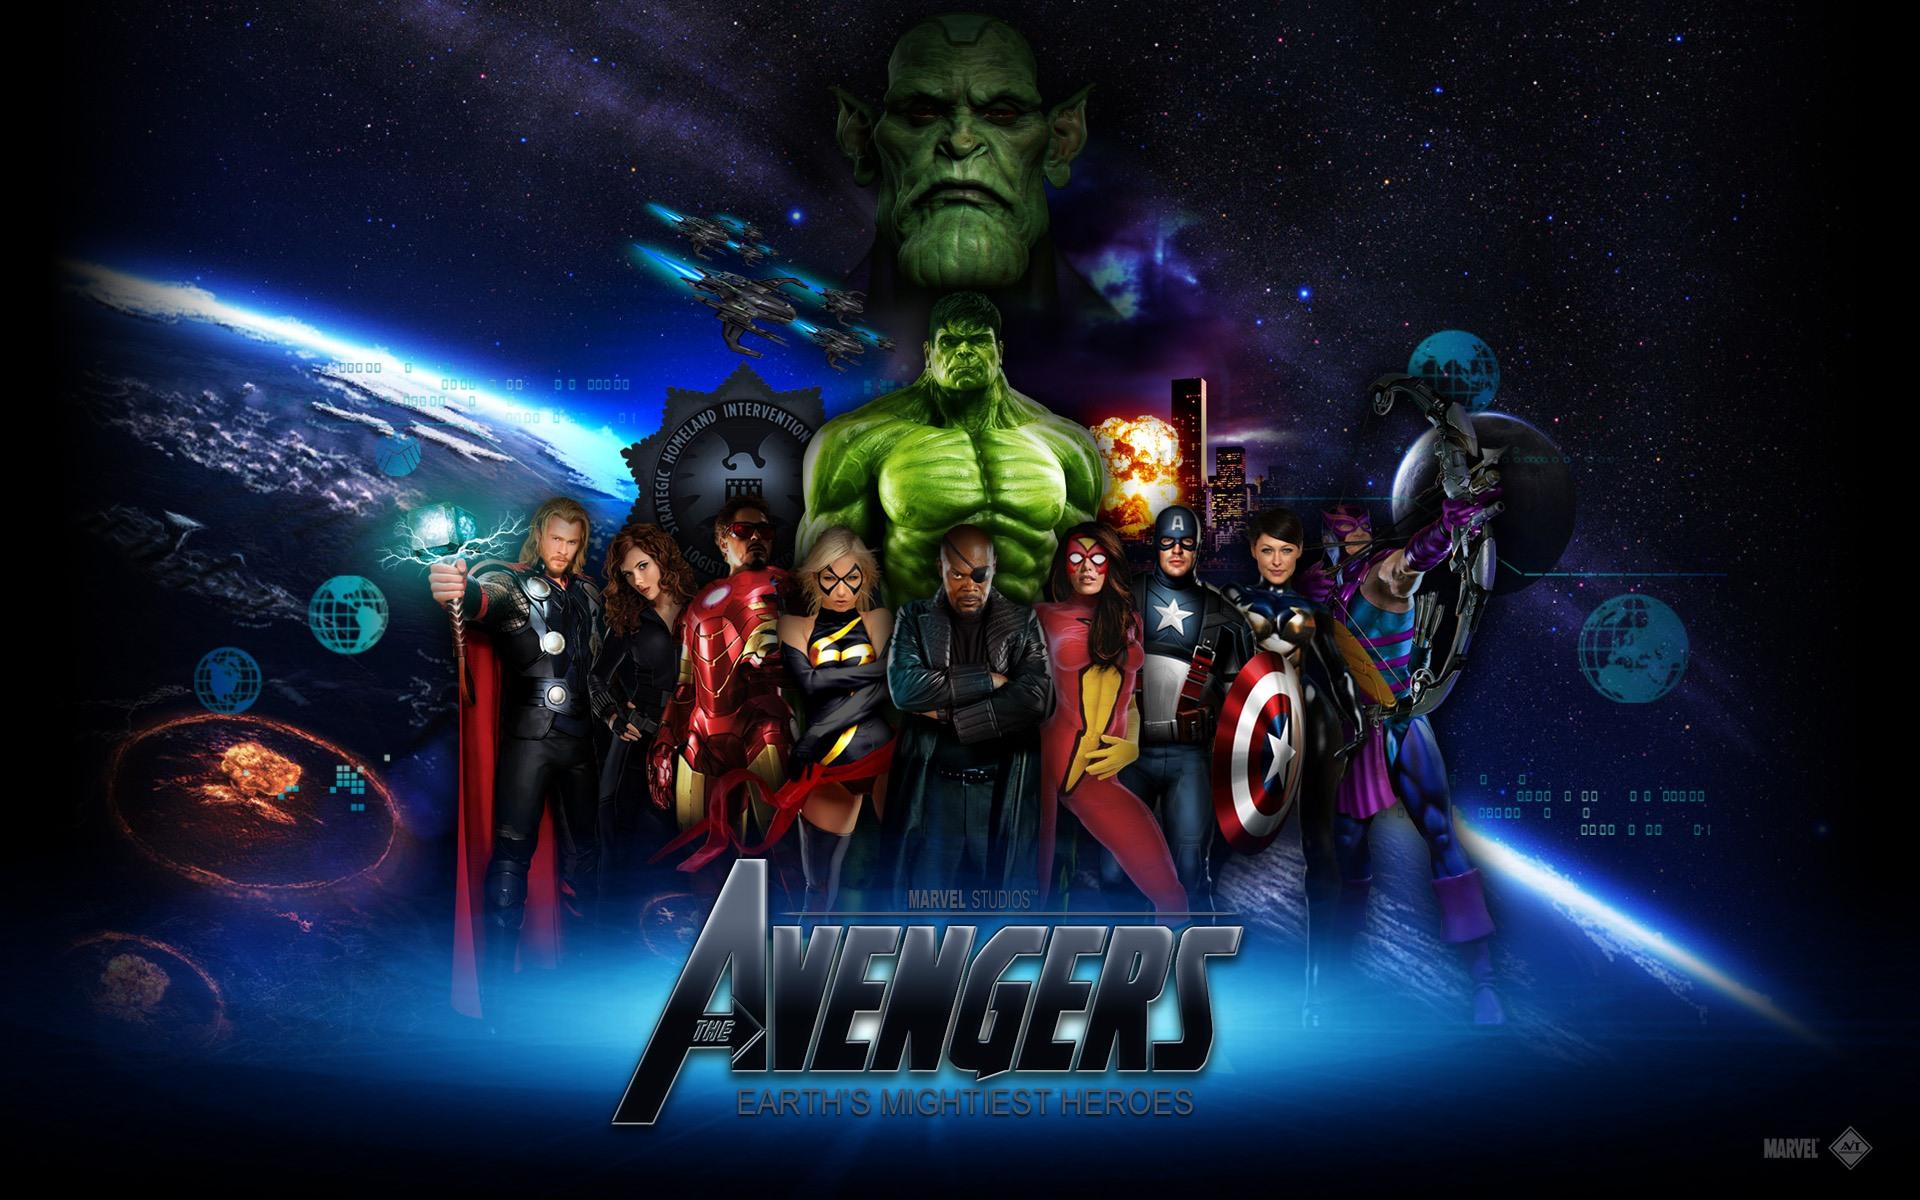 48 Free Avengers 2 Wallpaper On Wallpapersafari